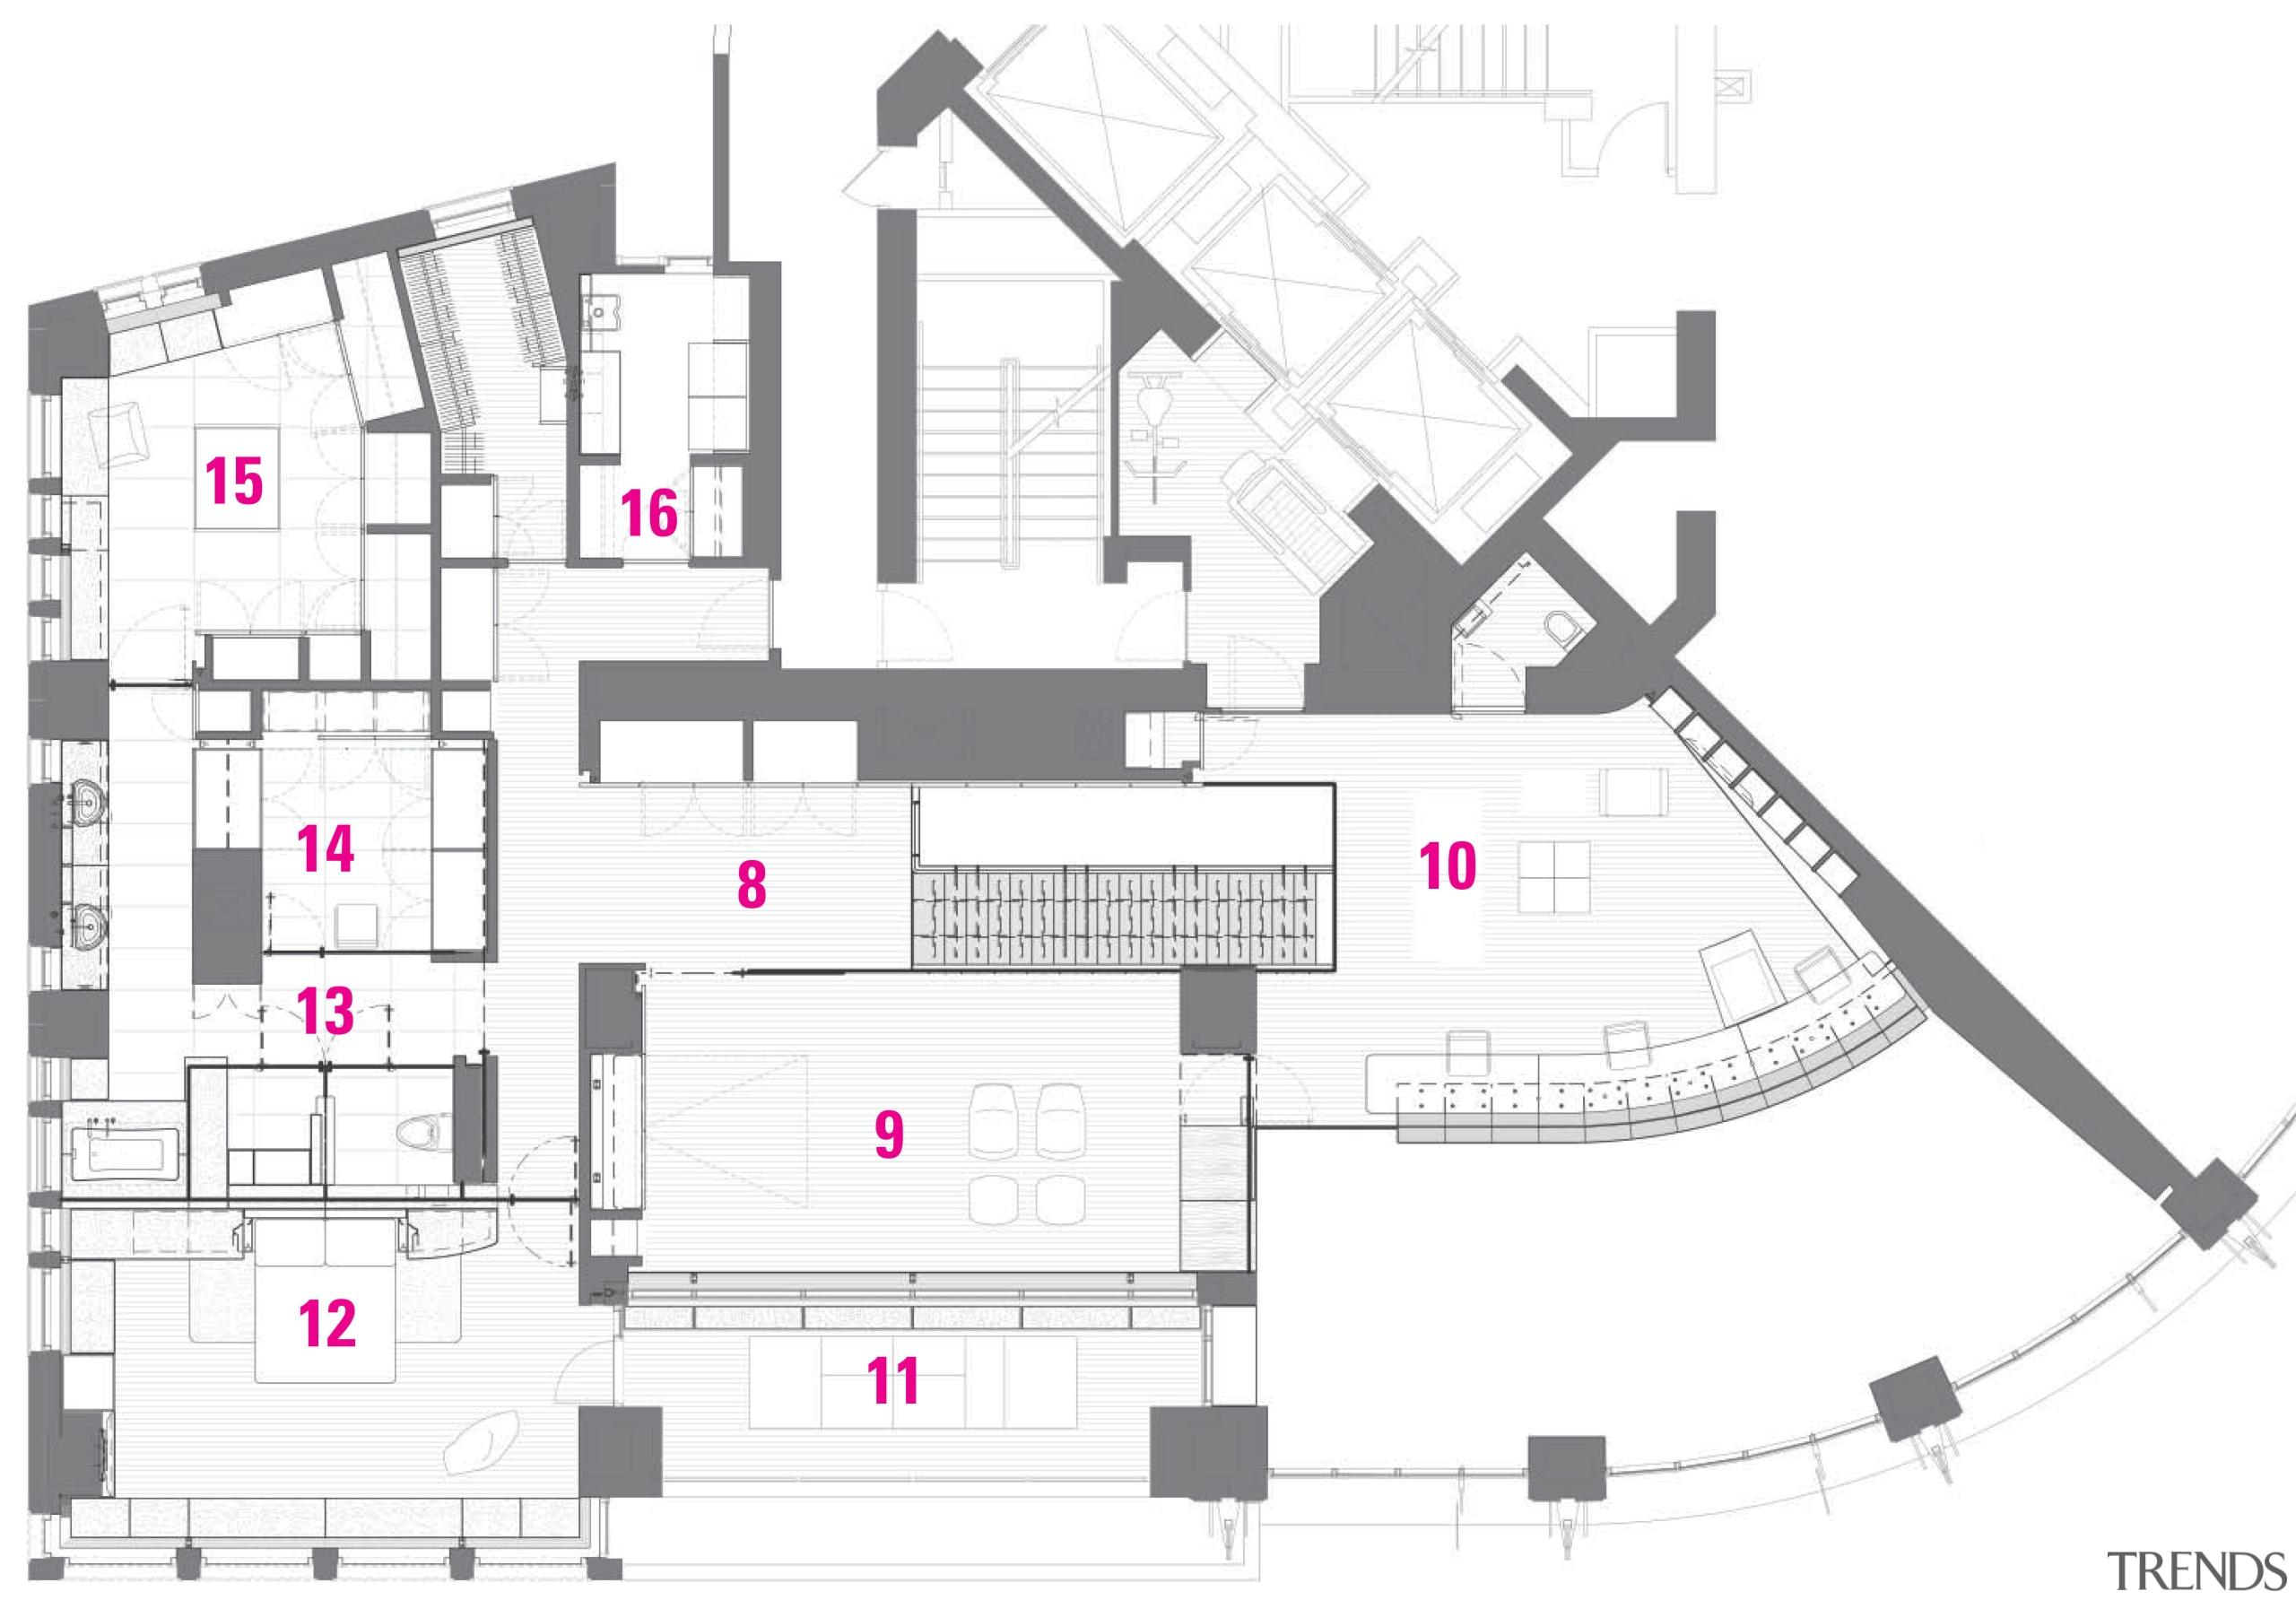 Floor plan. - Floor plan. - architecture | architecture, area, building, design, diagram, elevation, floor plan, line, plan, product design, residential area, schematic, structure, urban design, white